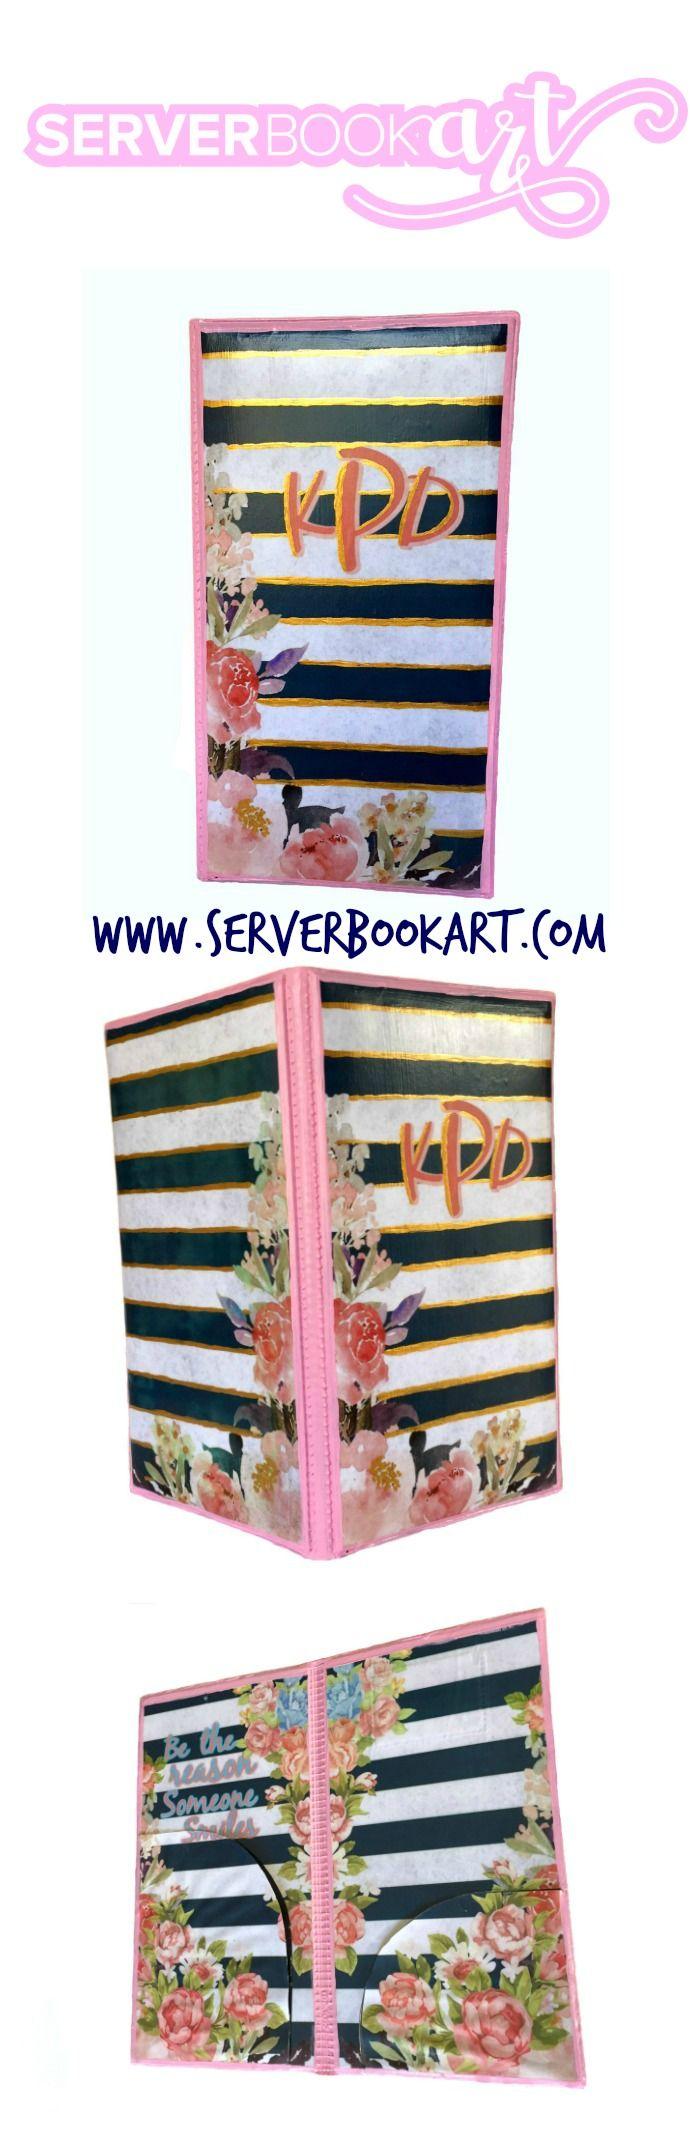 Monogram Server Book by Server Book Art Waitress book  #waitressbook #serverbook